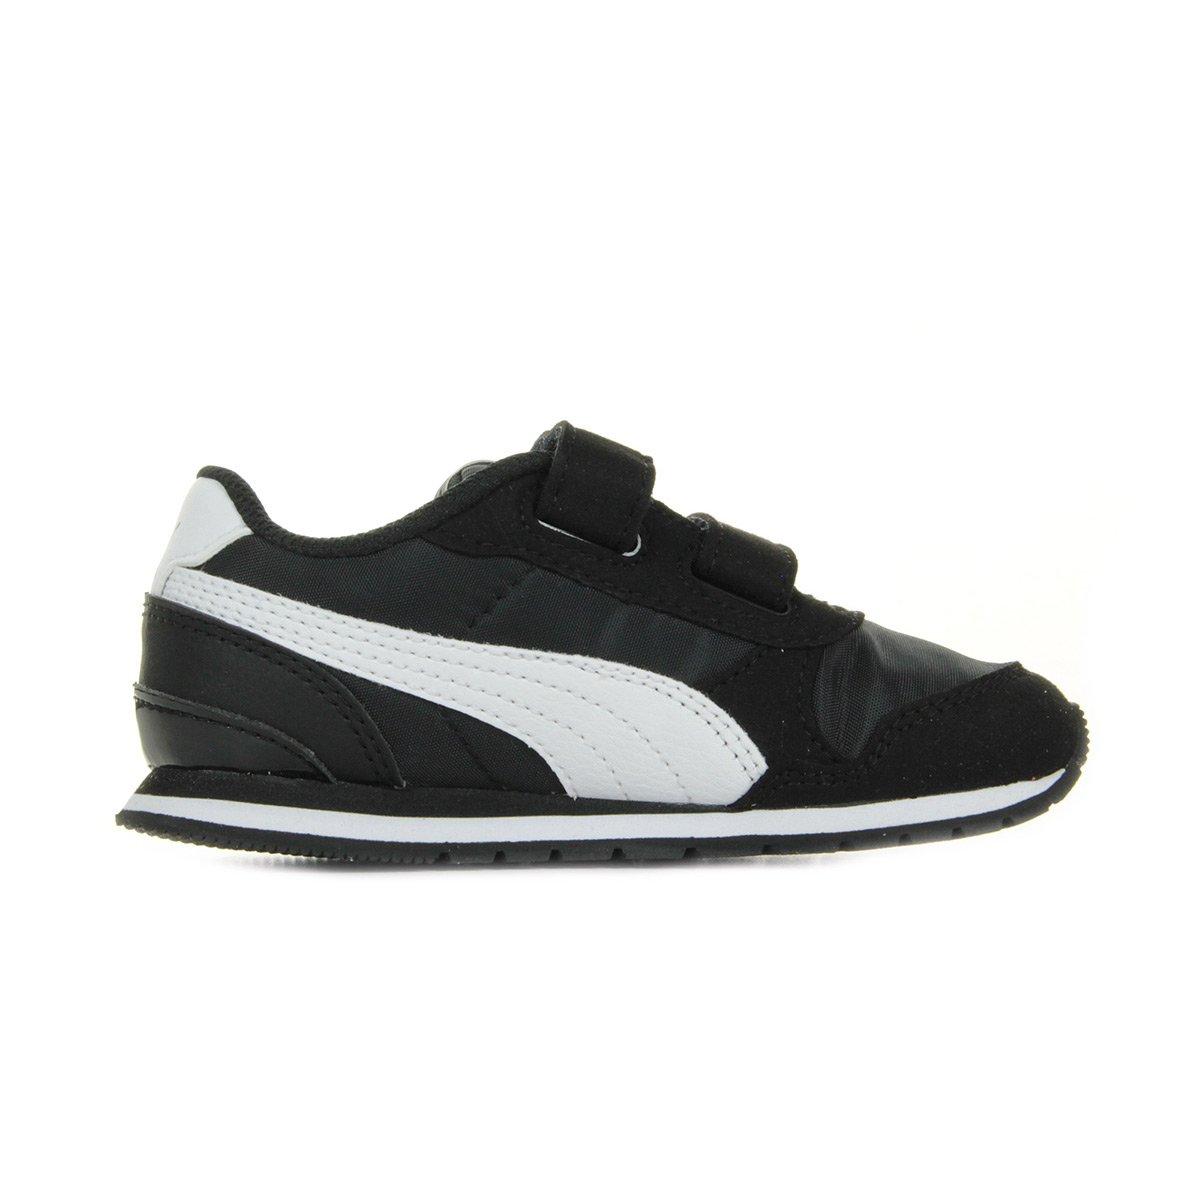 01 Nl V2 Noir Basses Sneakers Inf Puma St White Runner Eu 24 Black Mixte Enfant V A7wfx